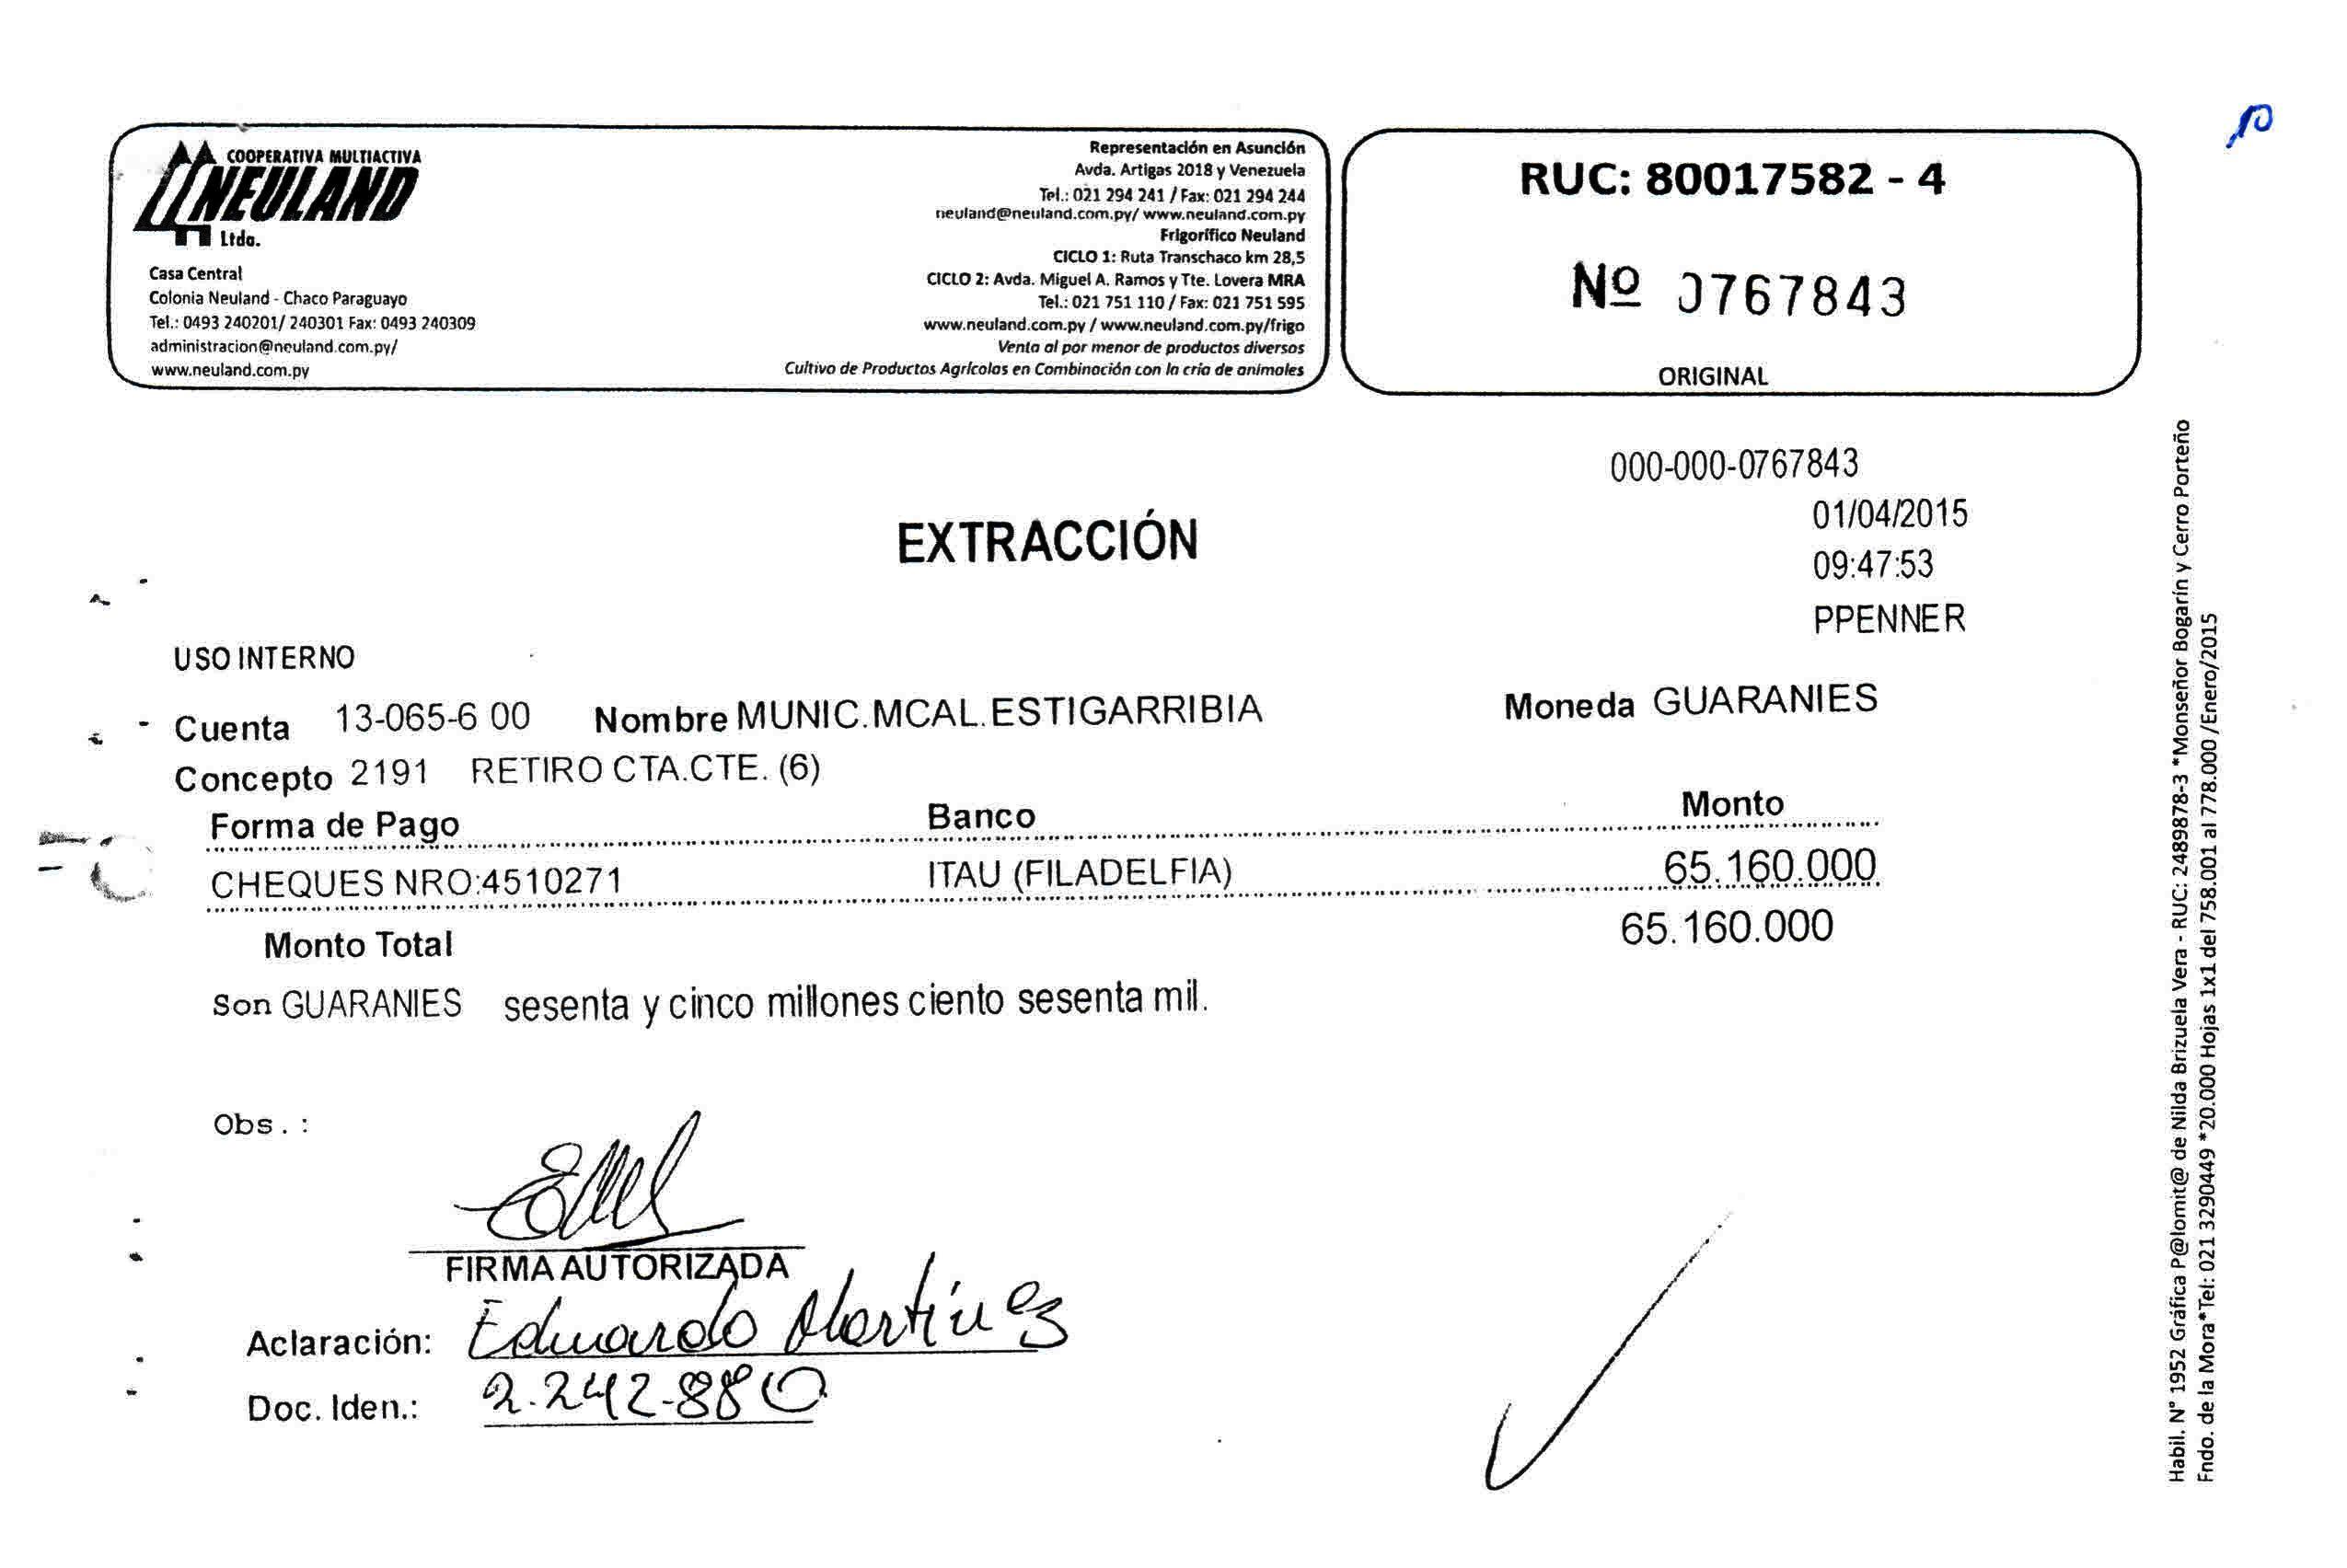 Para empezar bien abril de 2015, el concejal Martínez retiró G. 65 millones de la comuna.